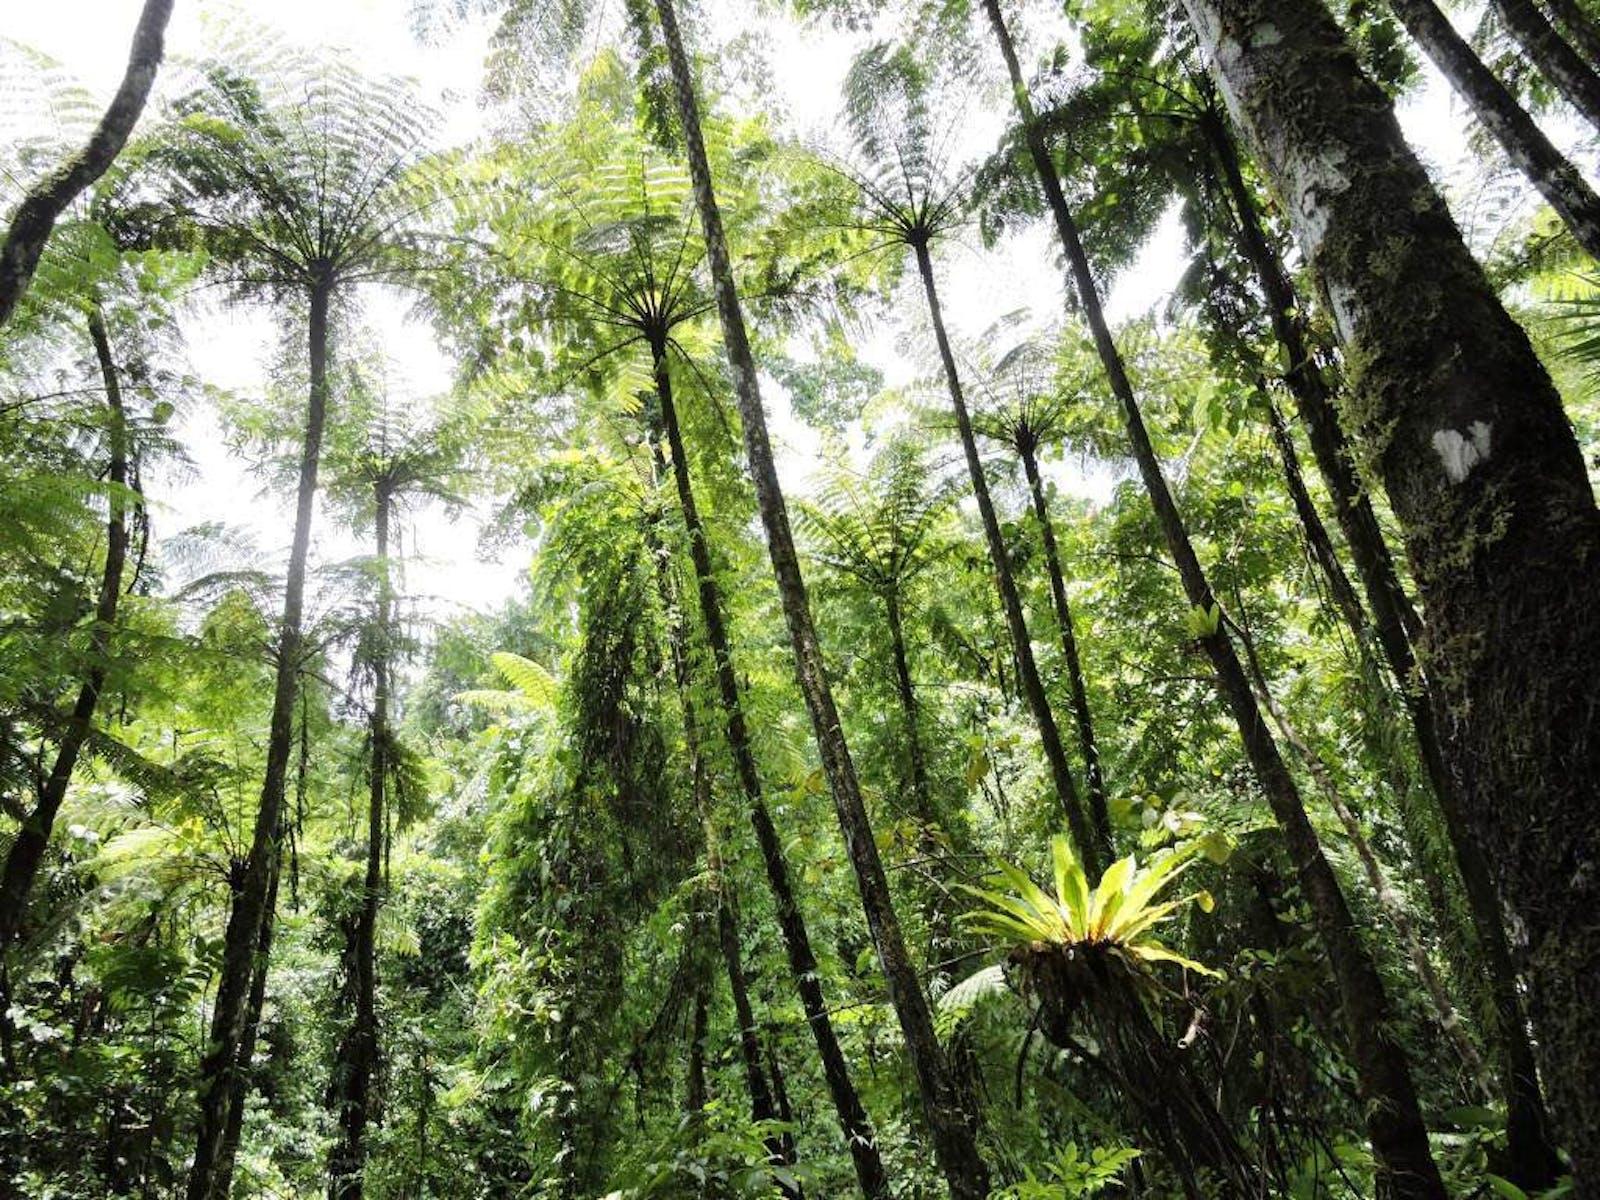 Nicobar Islands Rainforests